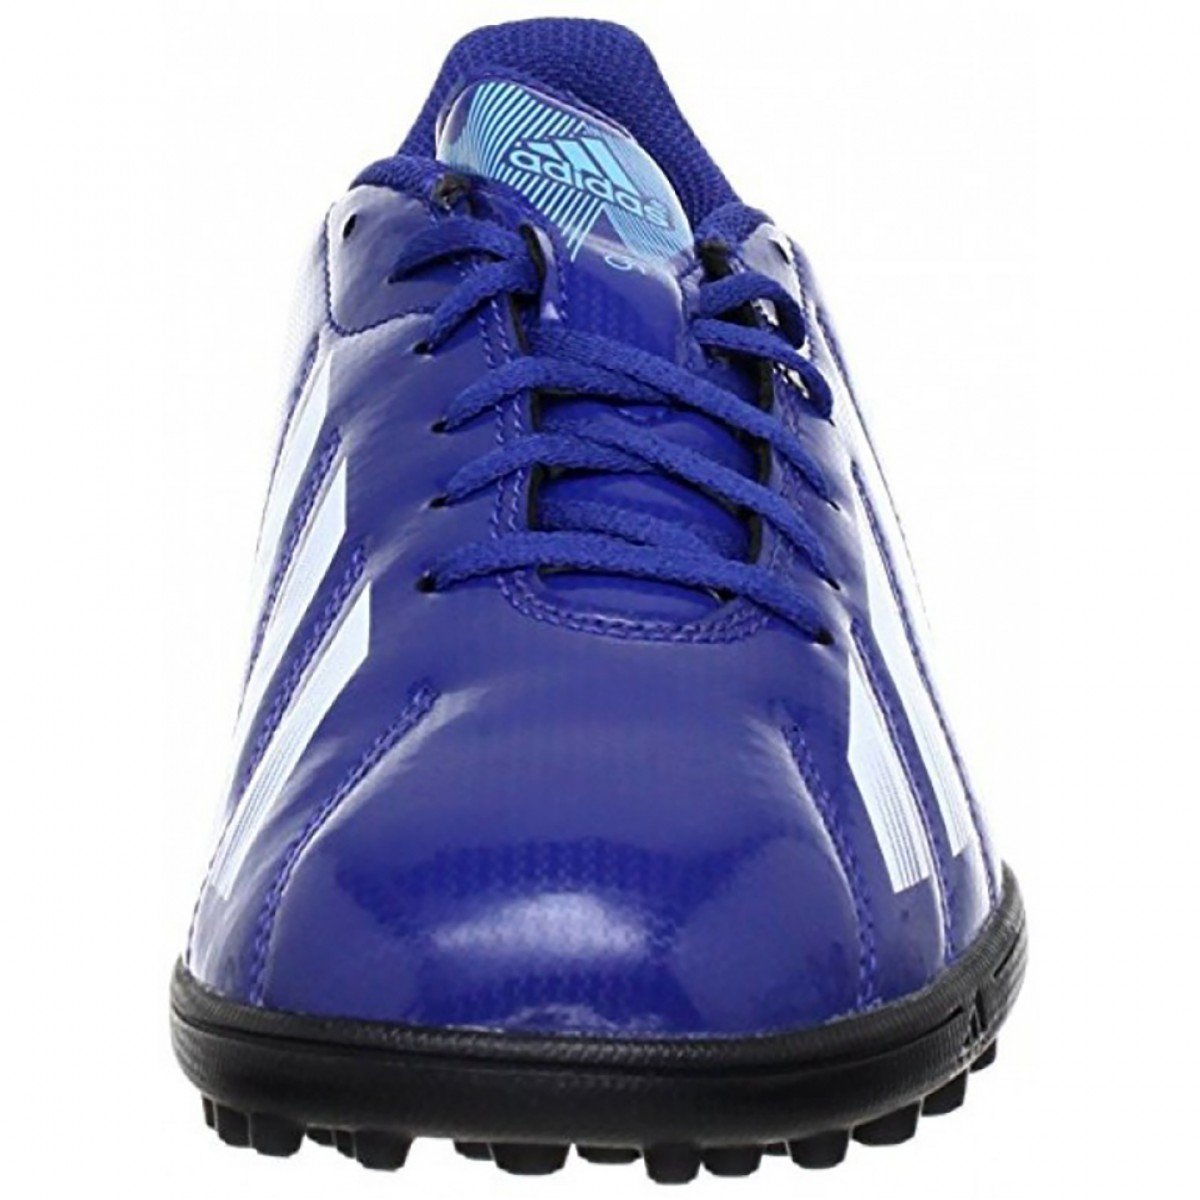 Chuteira Society Adidas F5 TRX TF Masculina Roxa - Compre Agora ... 57a238a37f4ee